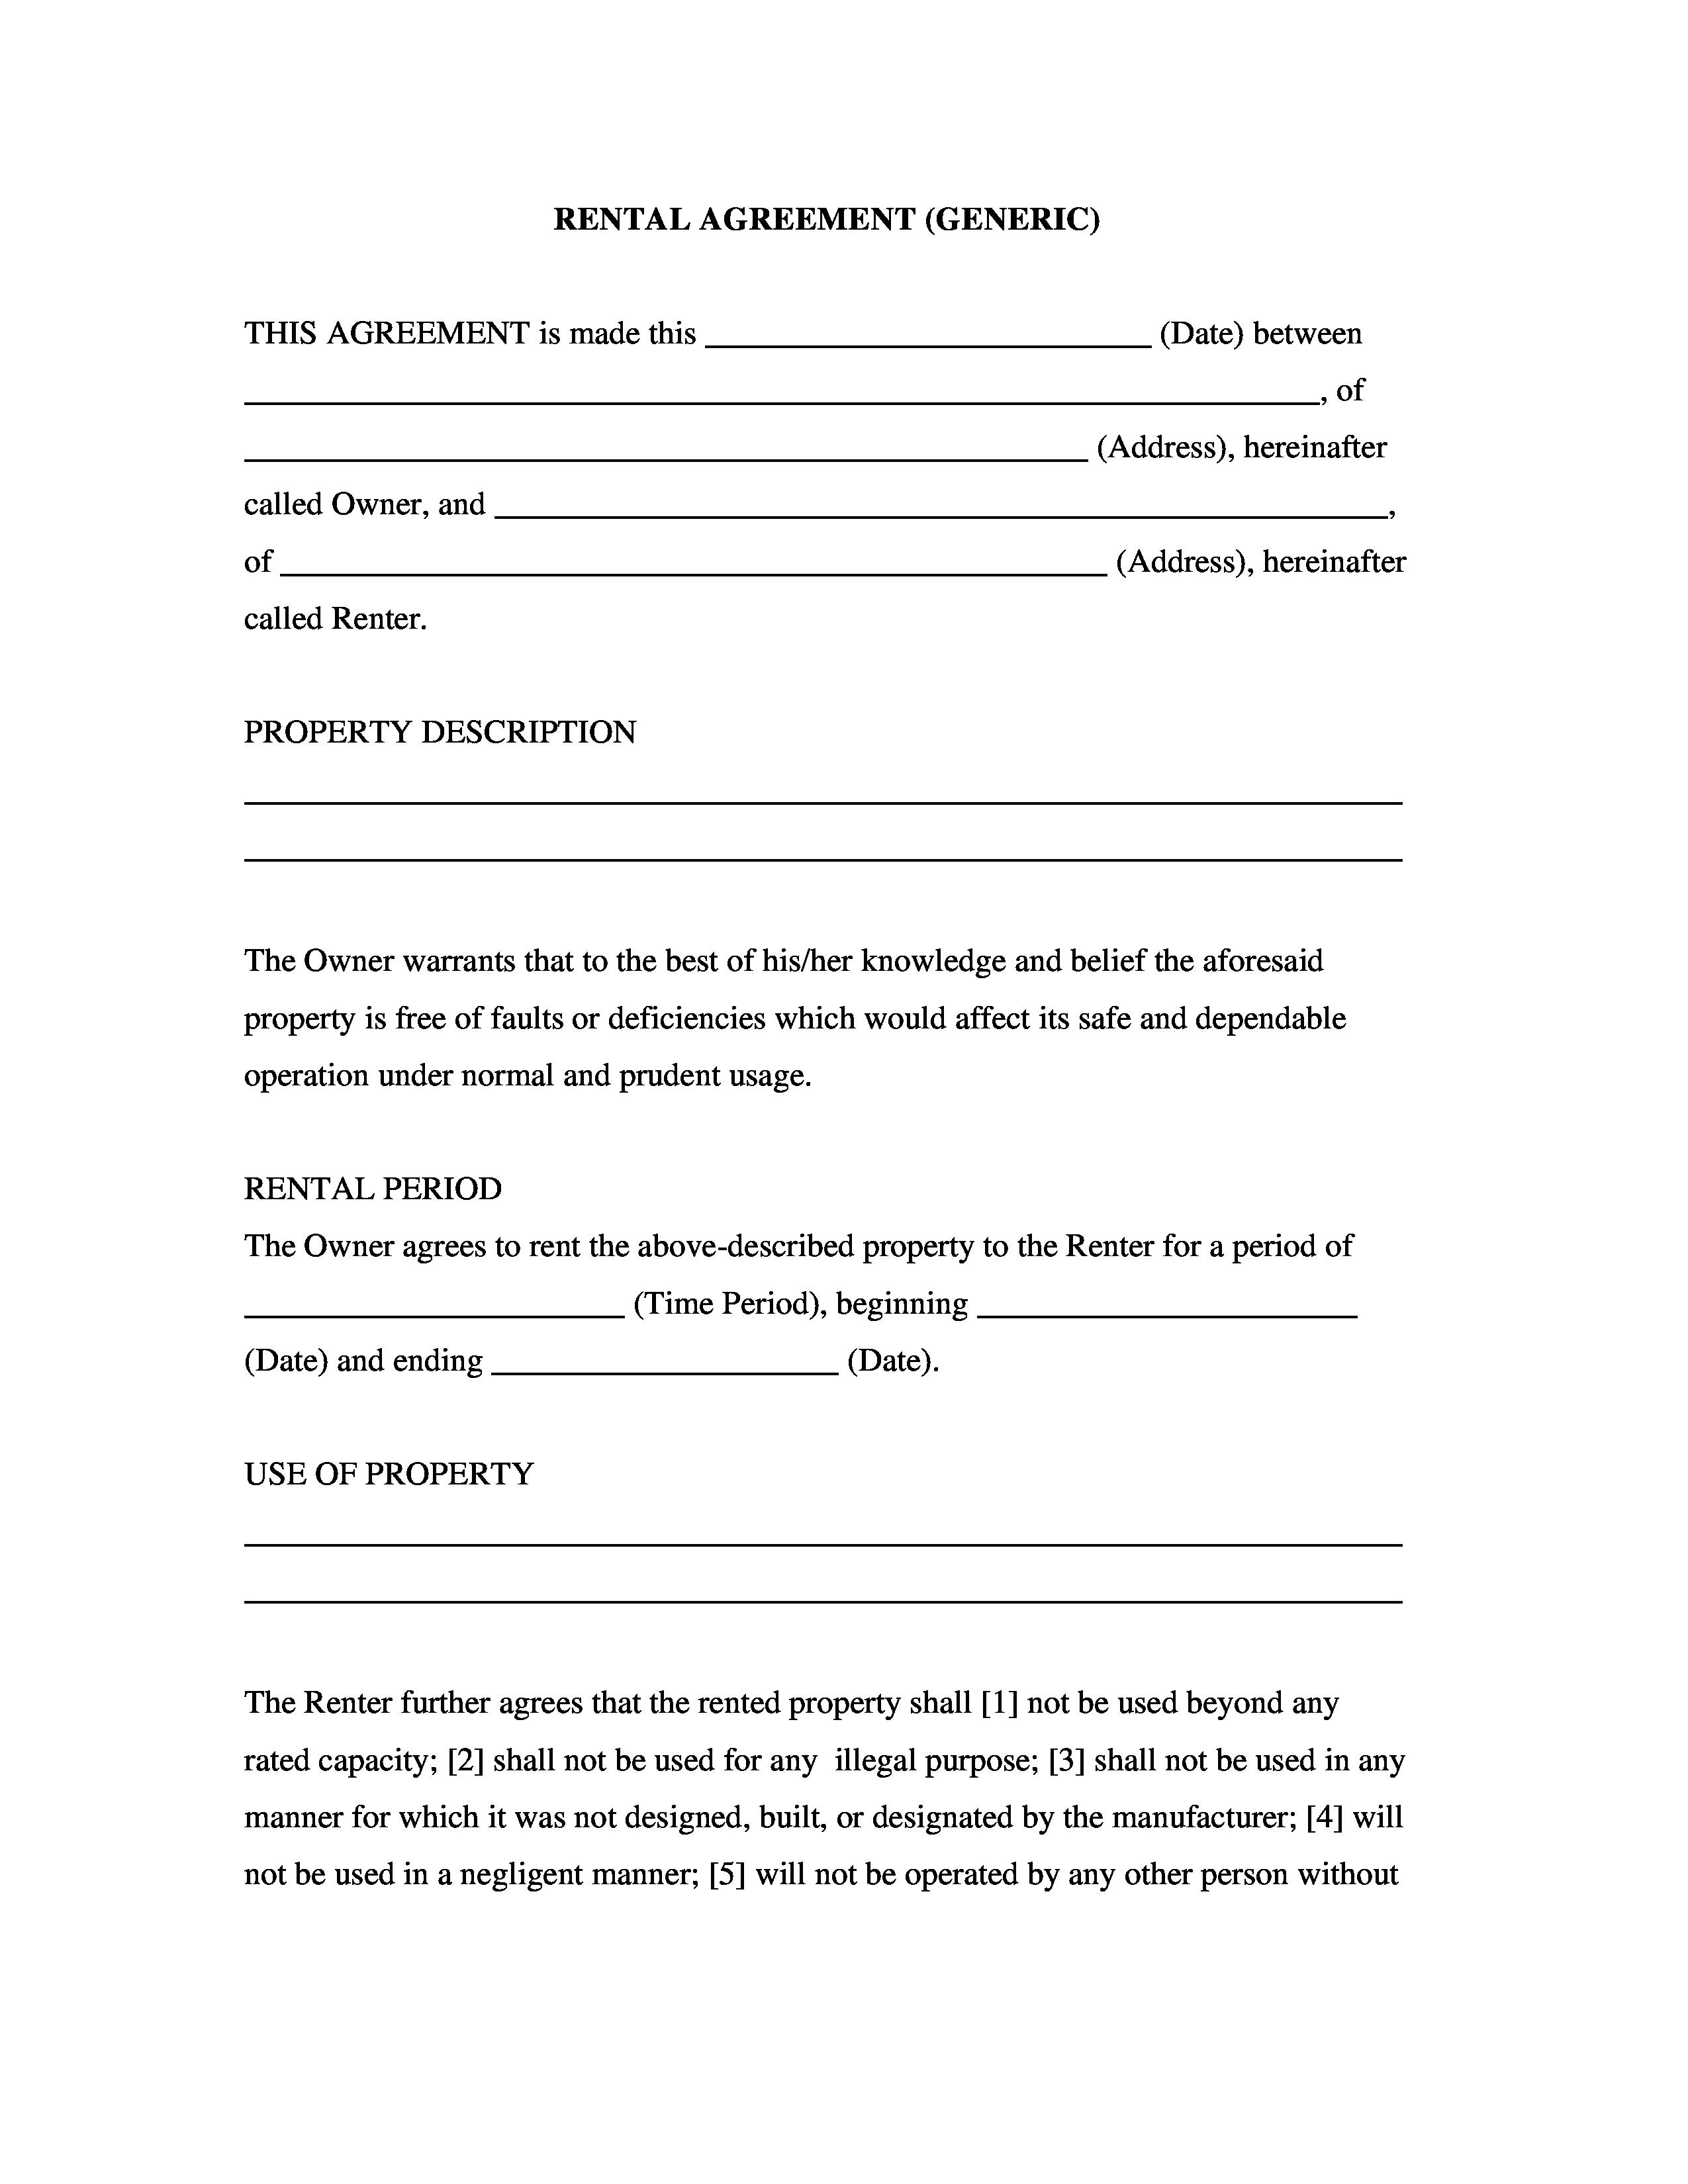 Generic Rental Contract Portablegasgrillweber